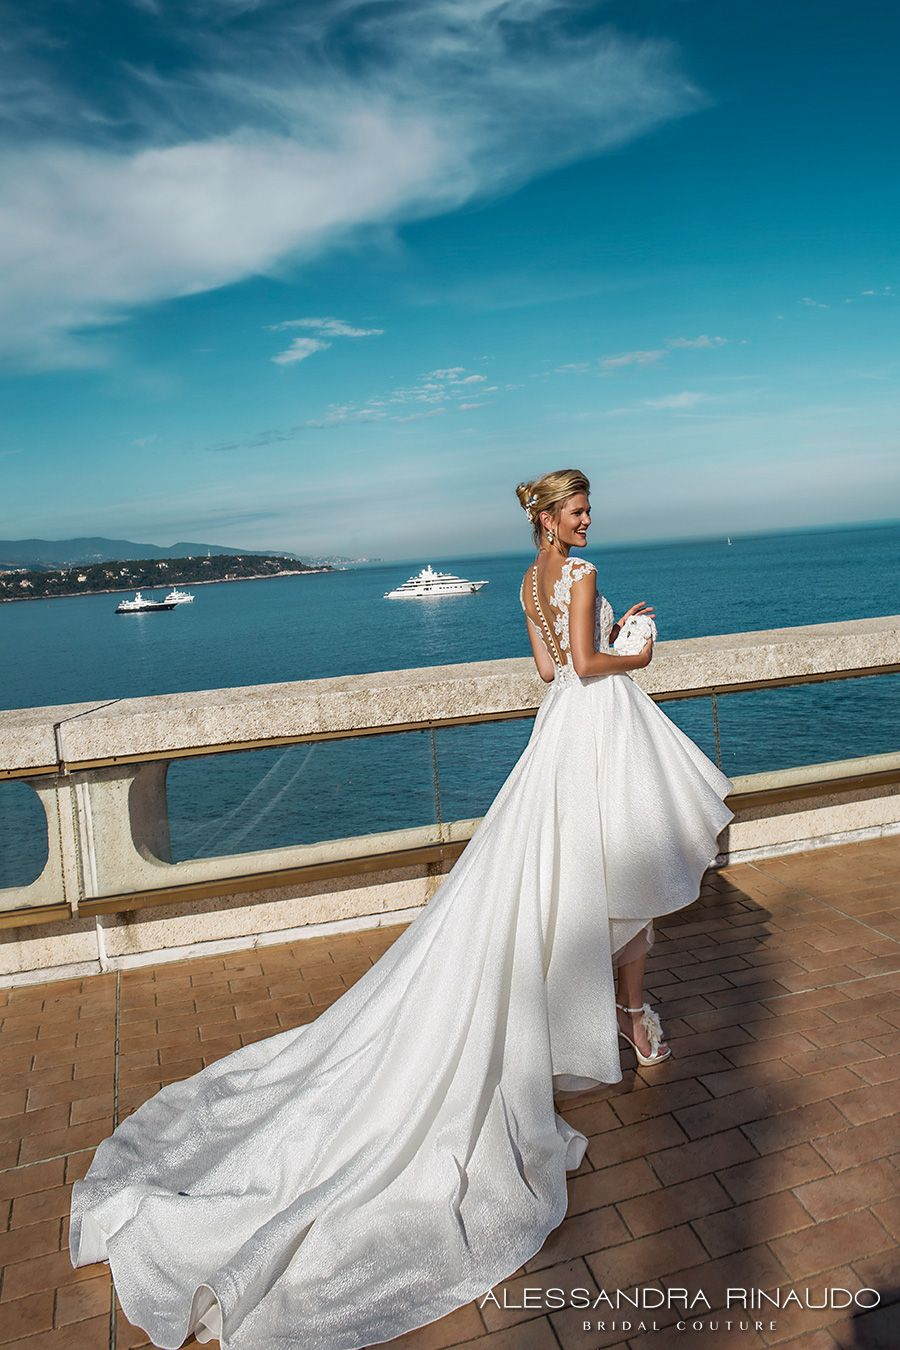 Alessandra Rinaudo 2017 Wedding Dresses — Gorgeous Italian Bridal ...